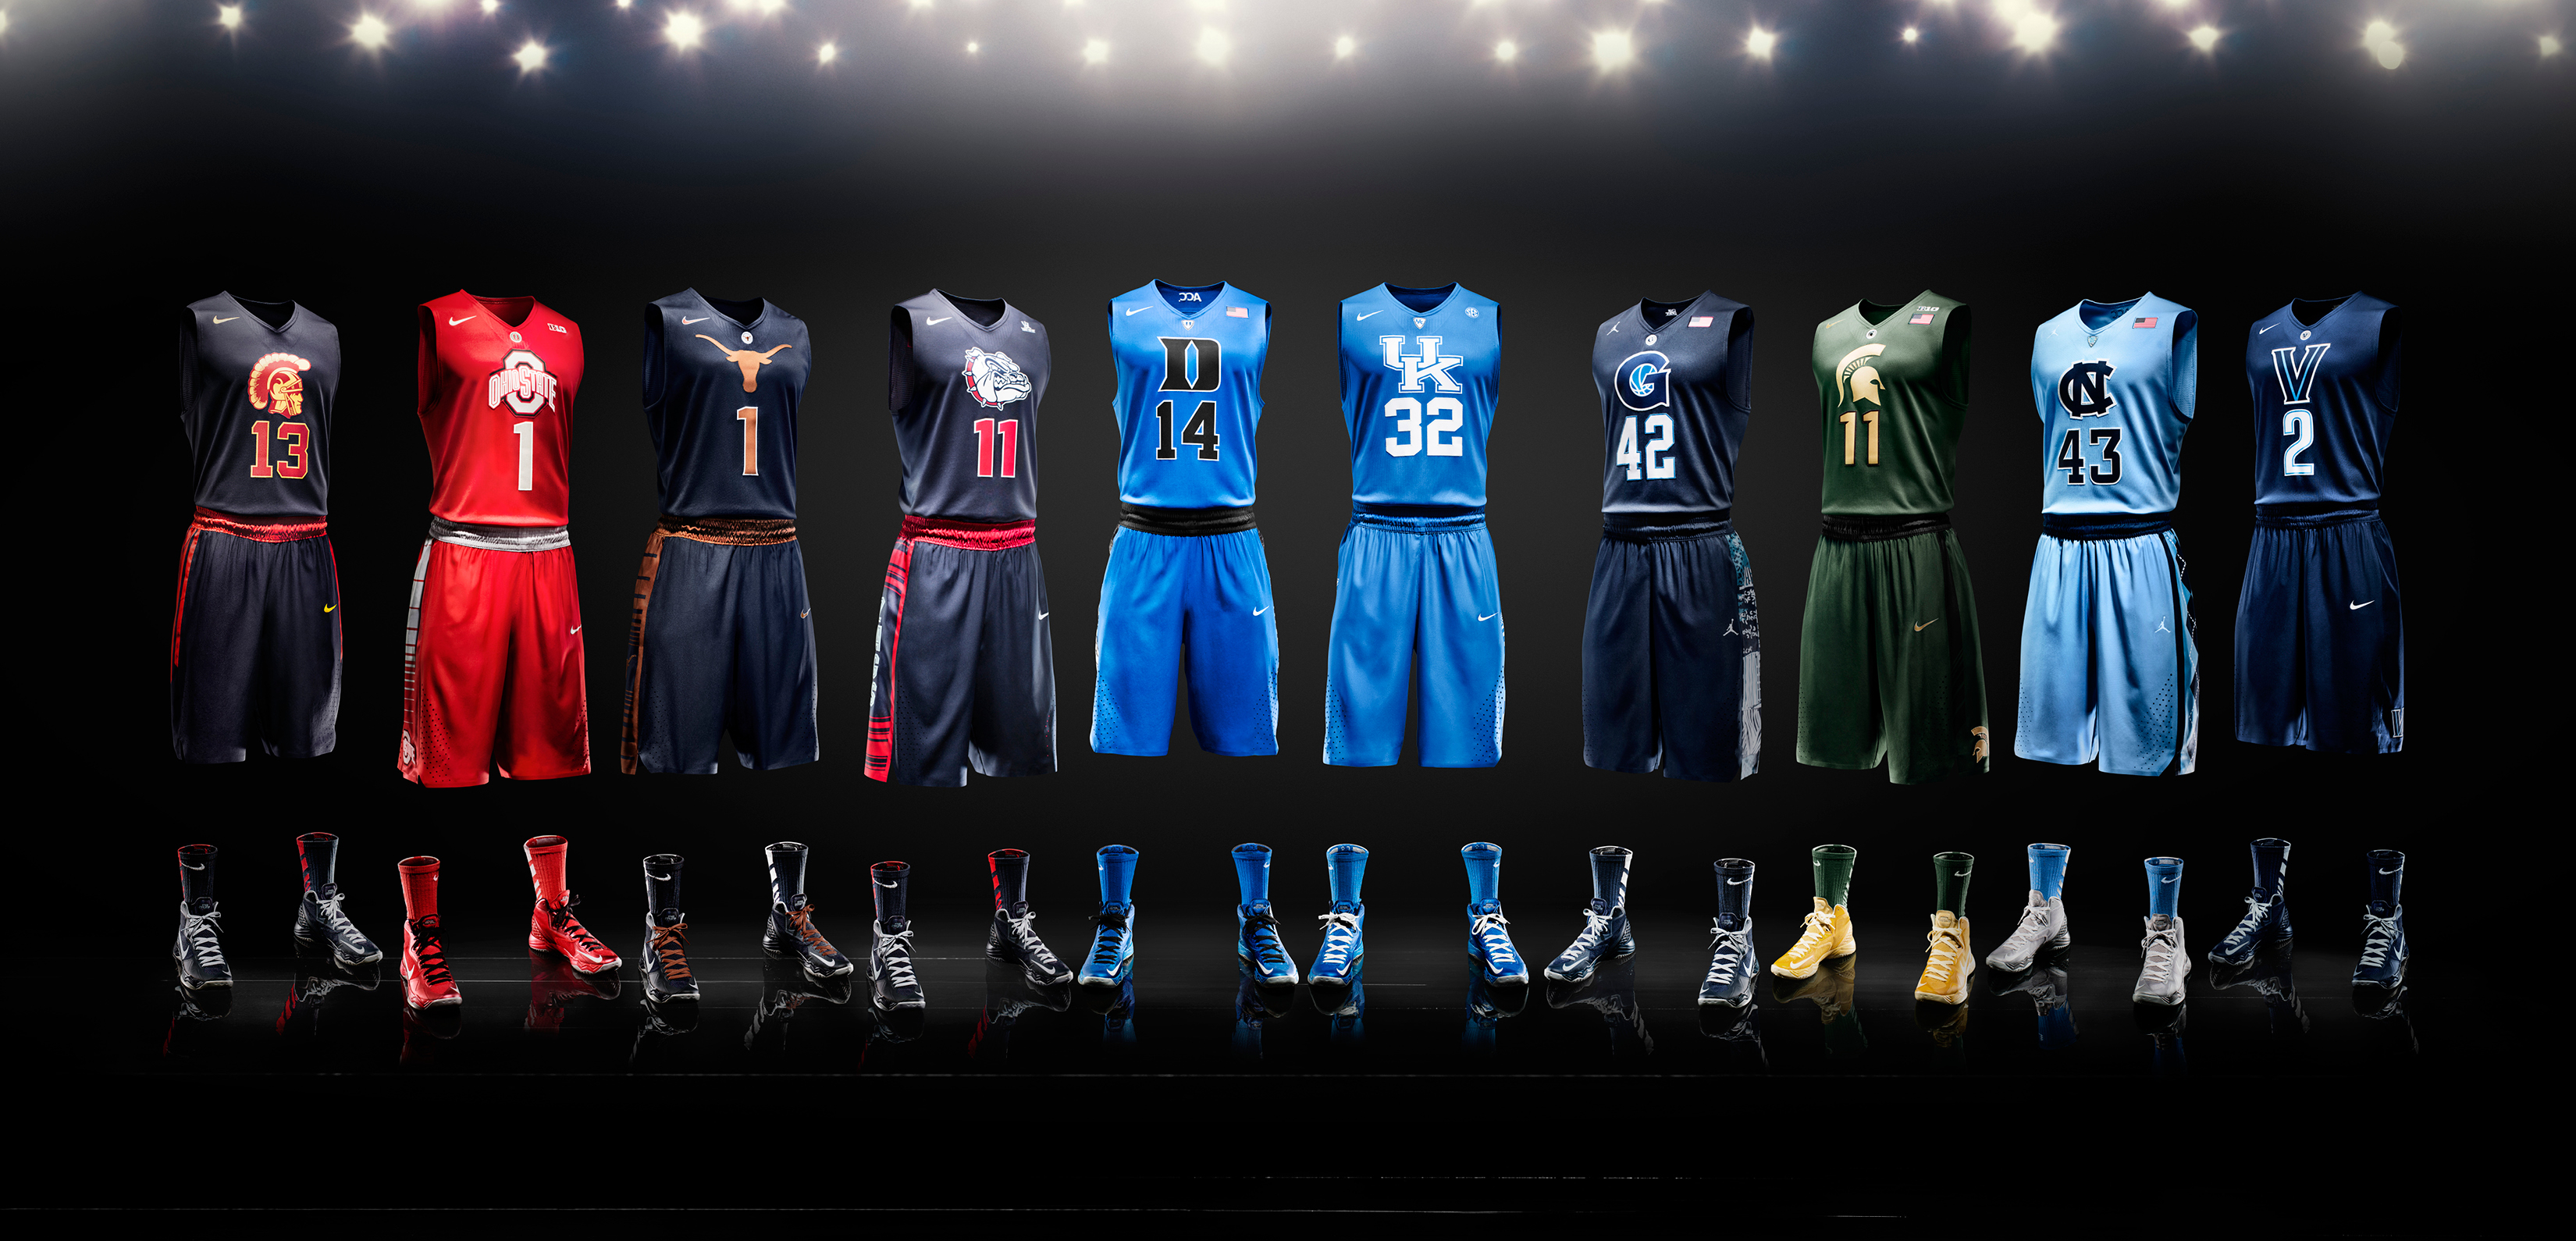 super popular 47f8f fb13c The evolution of Nike's college basketball uniforms | SI.com